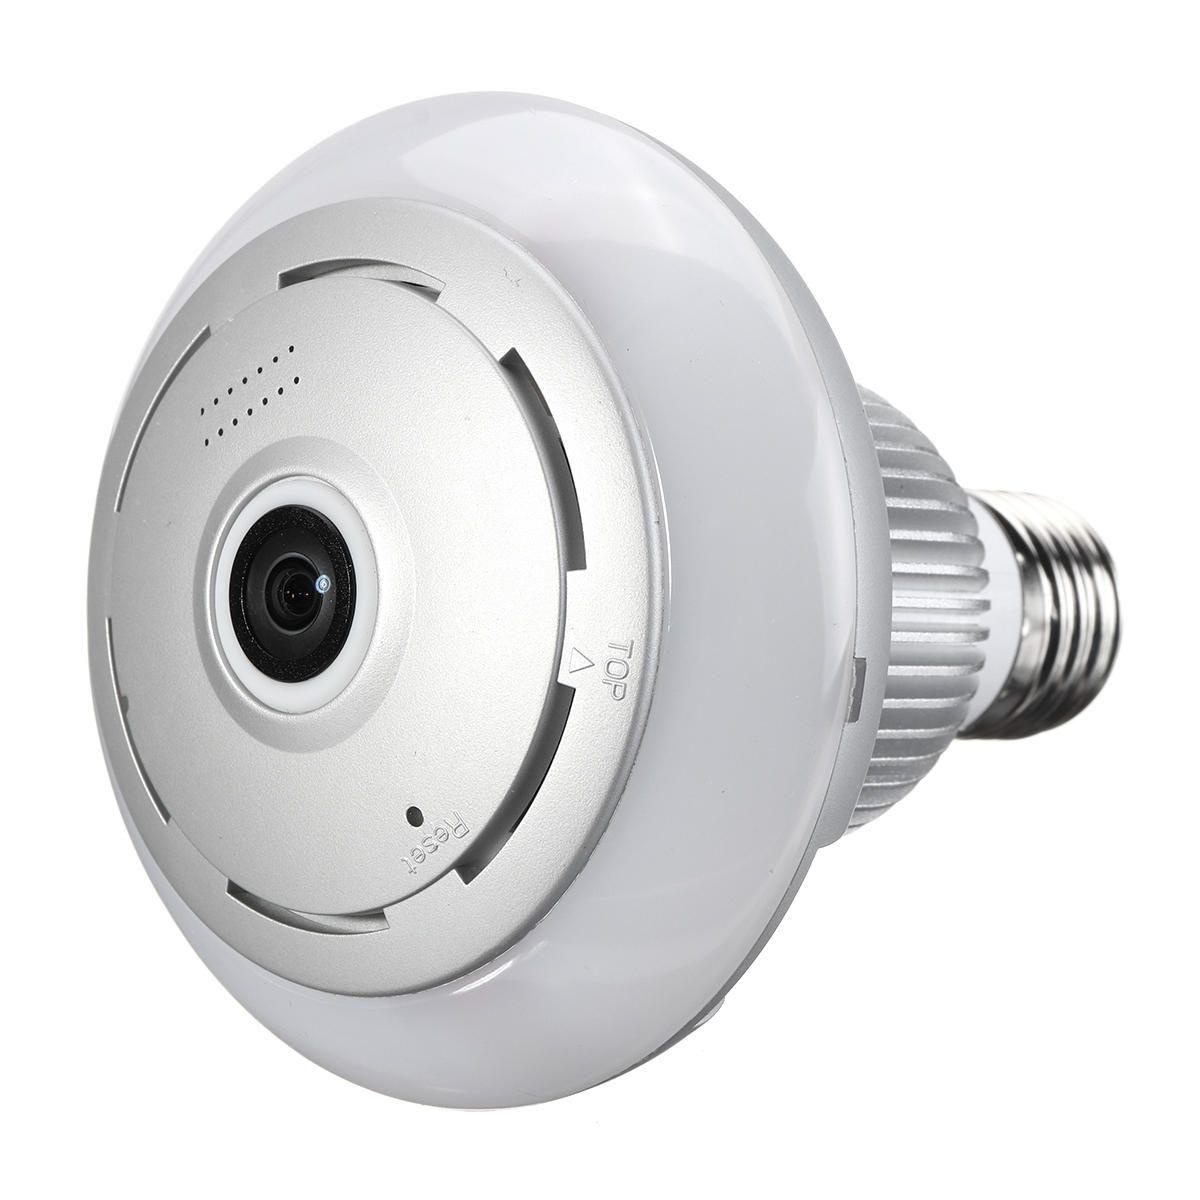 360° WiFi Wireless Panoramic 960P Fisheye Light Bulb IP Camera Lamp APP Control